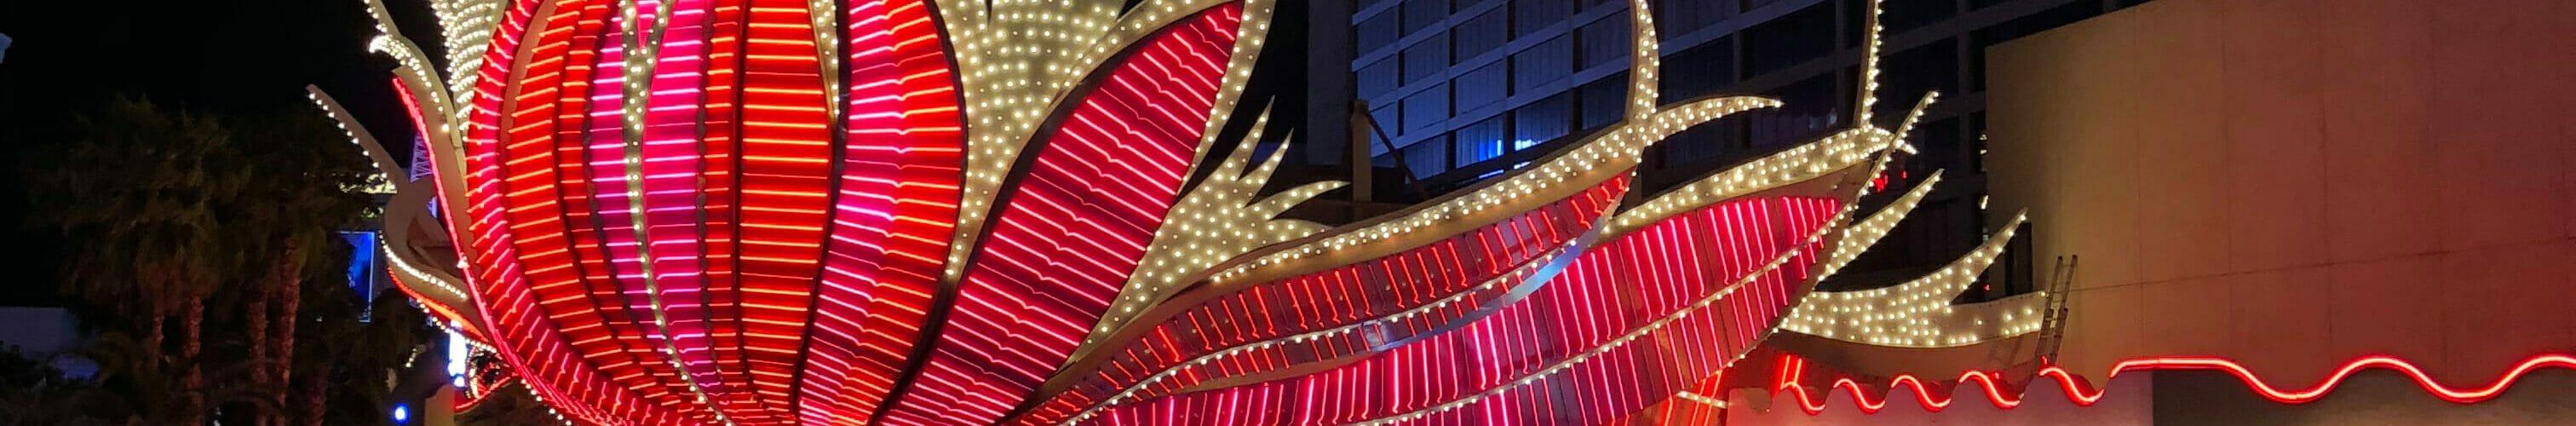 Flamingo Las Vegas as seen in 2018